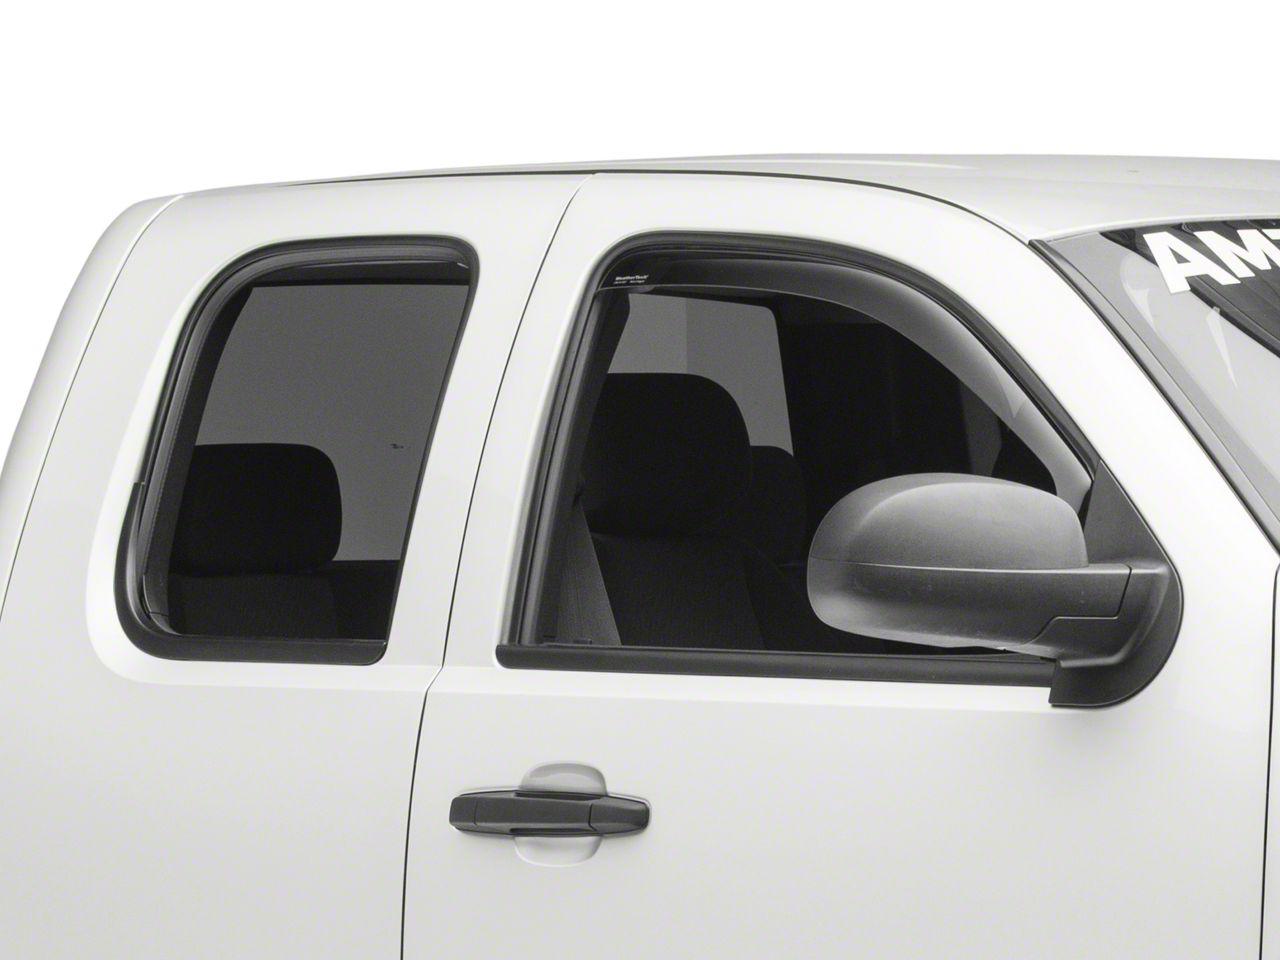 Lightronic WV194528 in-Channel Window Visors Rain Guards Smoke Tint 4PCS Set for 2014-2018 Silverado//Sierra 1500 with Extended Cab; 2015-2018 Silverado//Sierra 2500HD /& 3500HD with Extended Cab